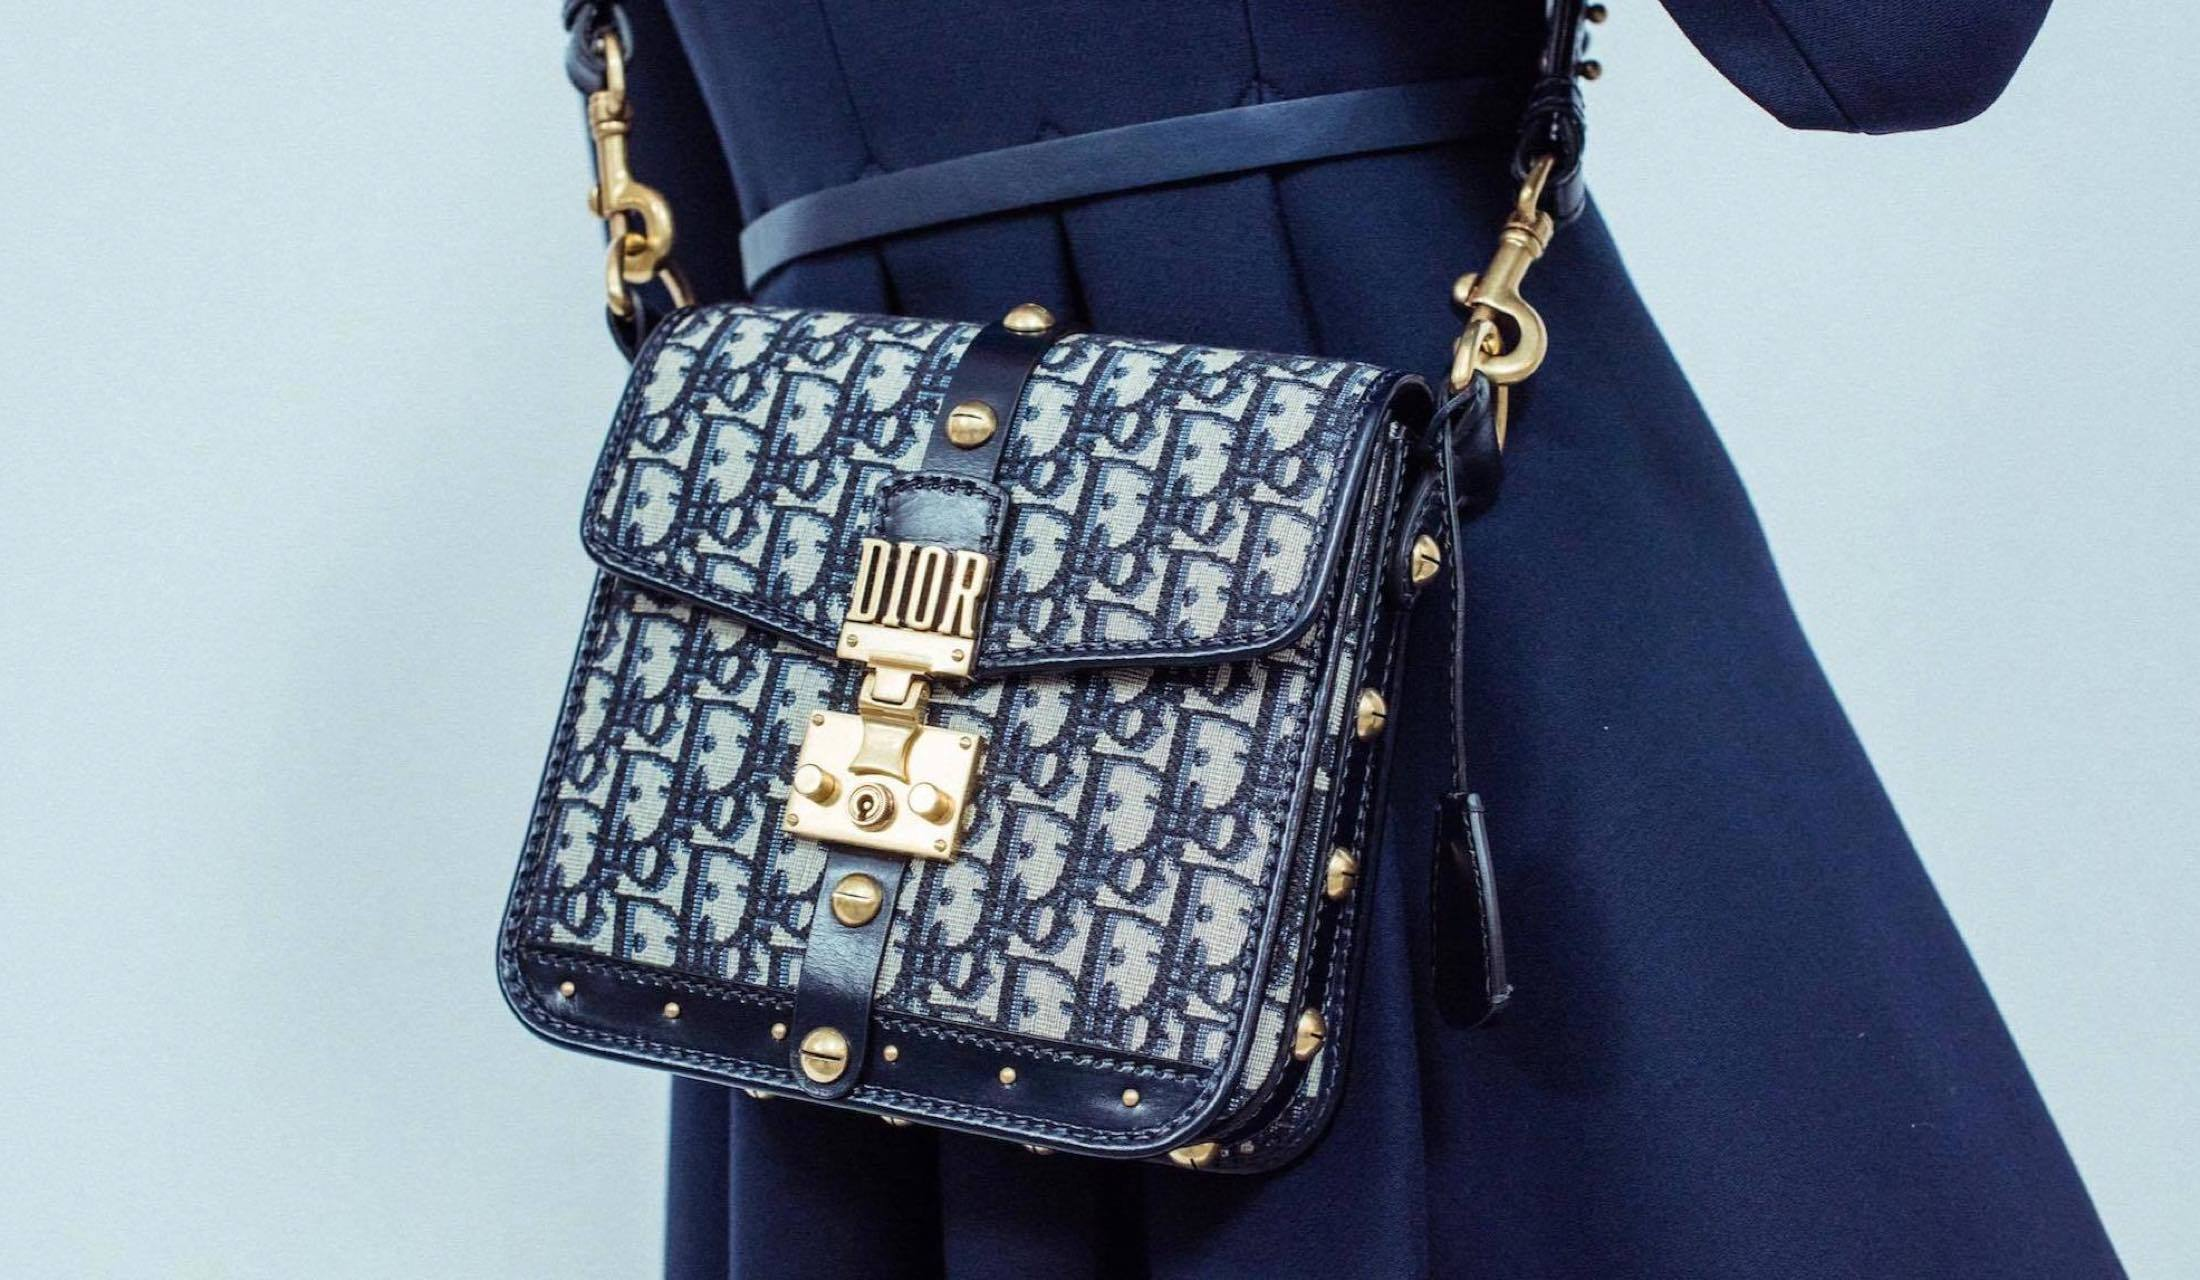 Diorの新ITバッグ「DIOR OBLIQUE (ディオール オブリーク)」